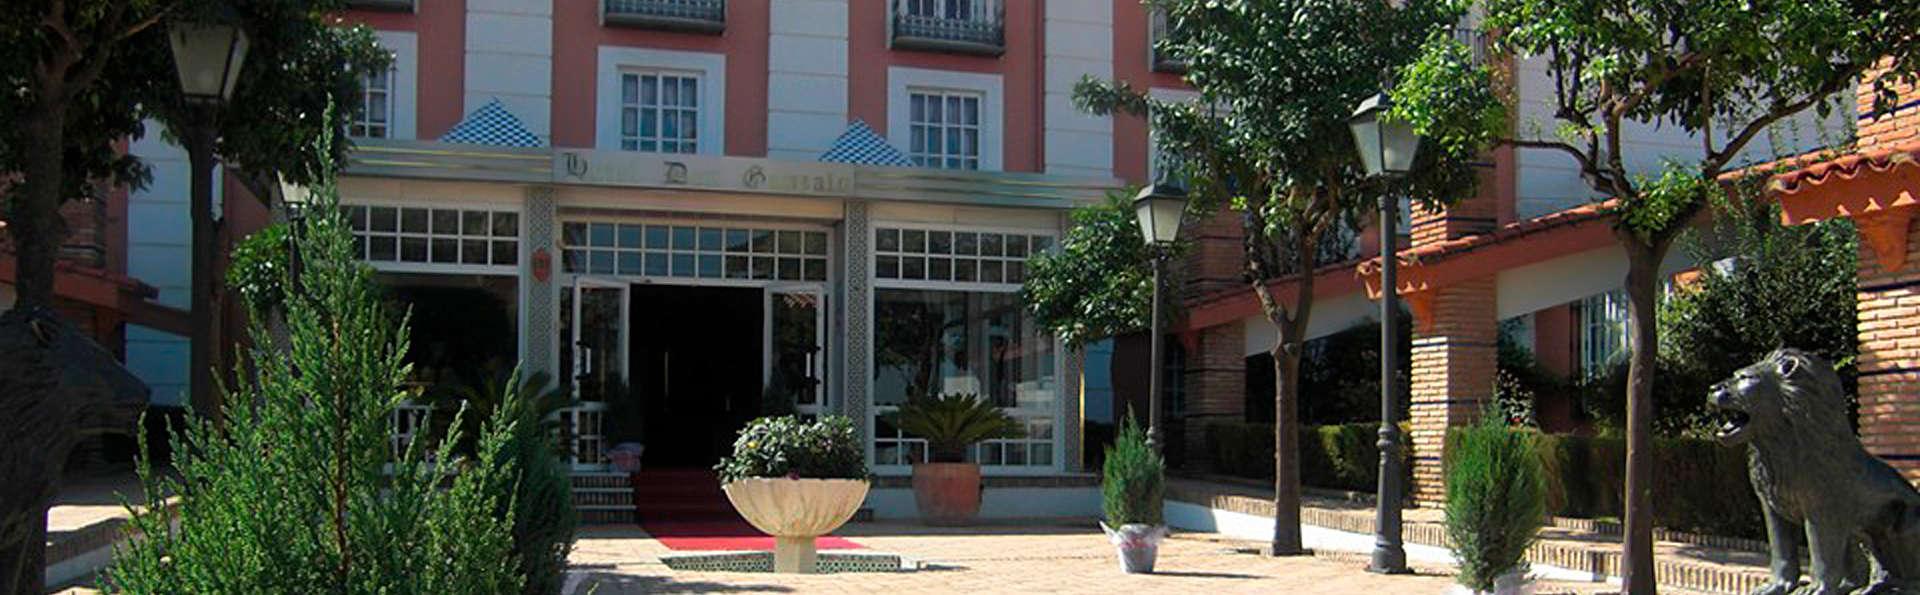 Hotel Don Gonzalo - edit_front.jpg